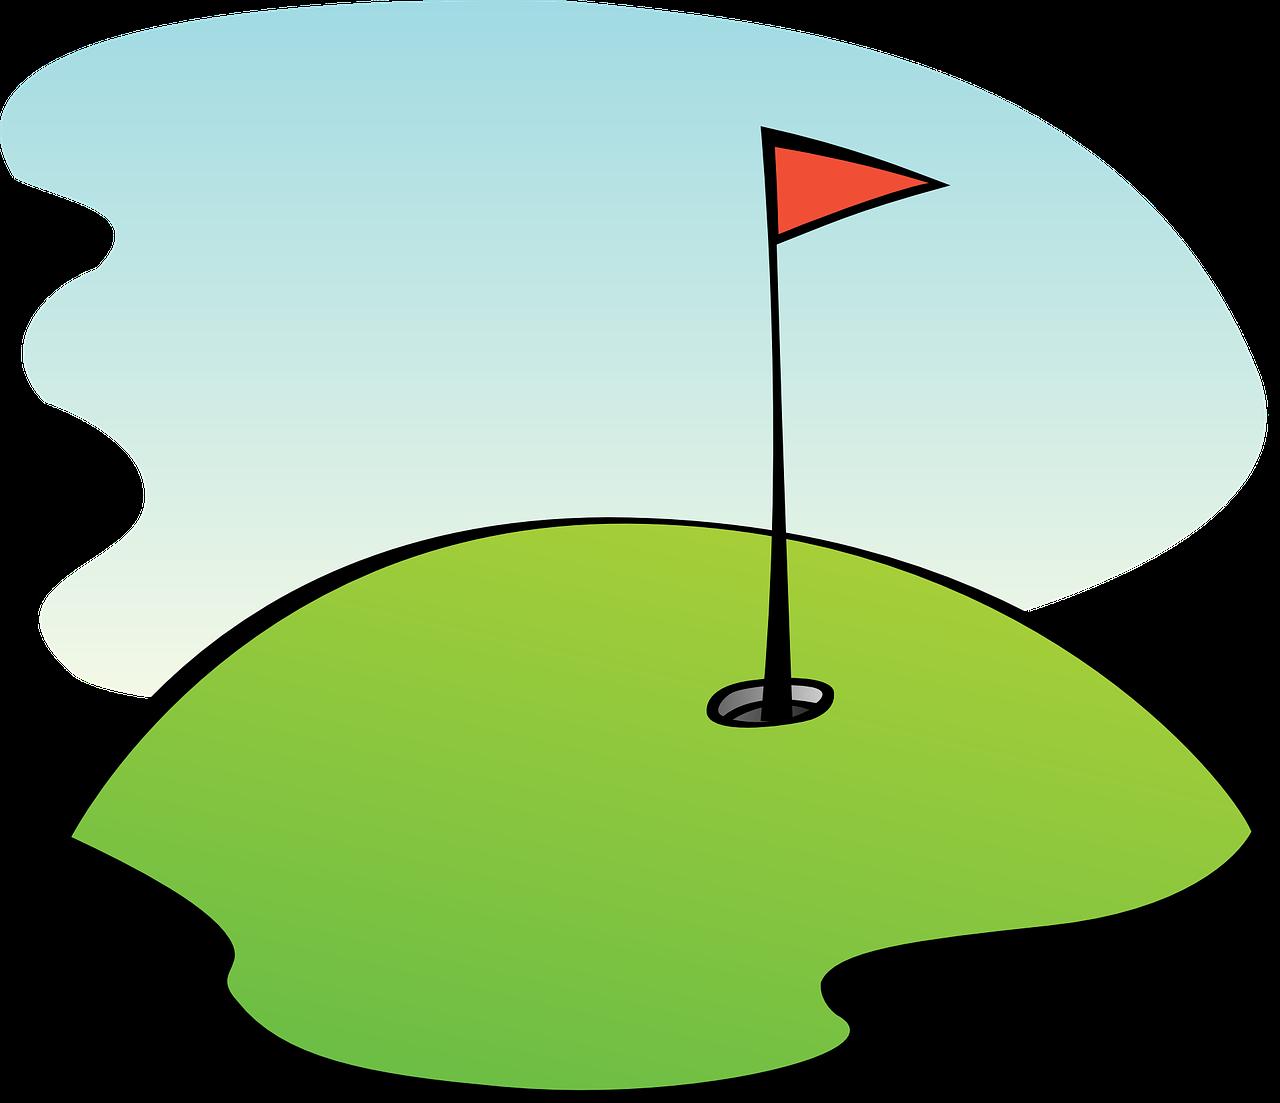 golf rules unplayable lie